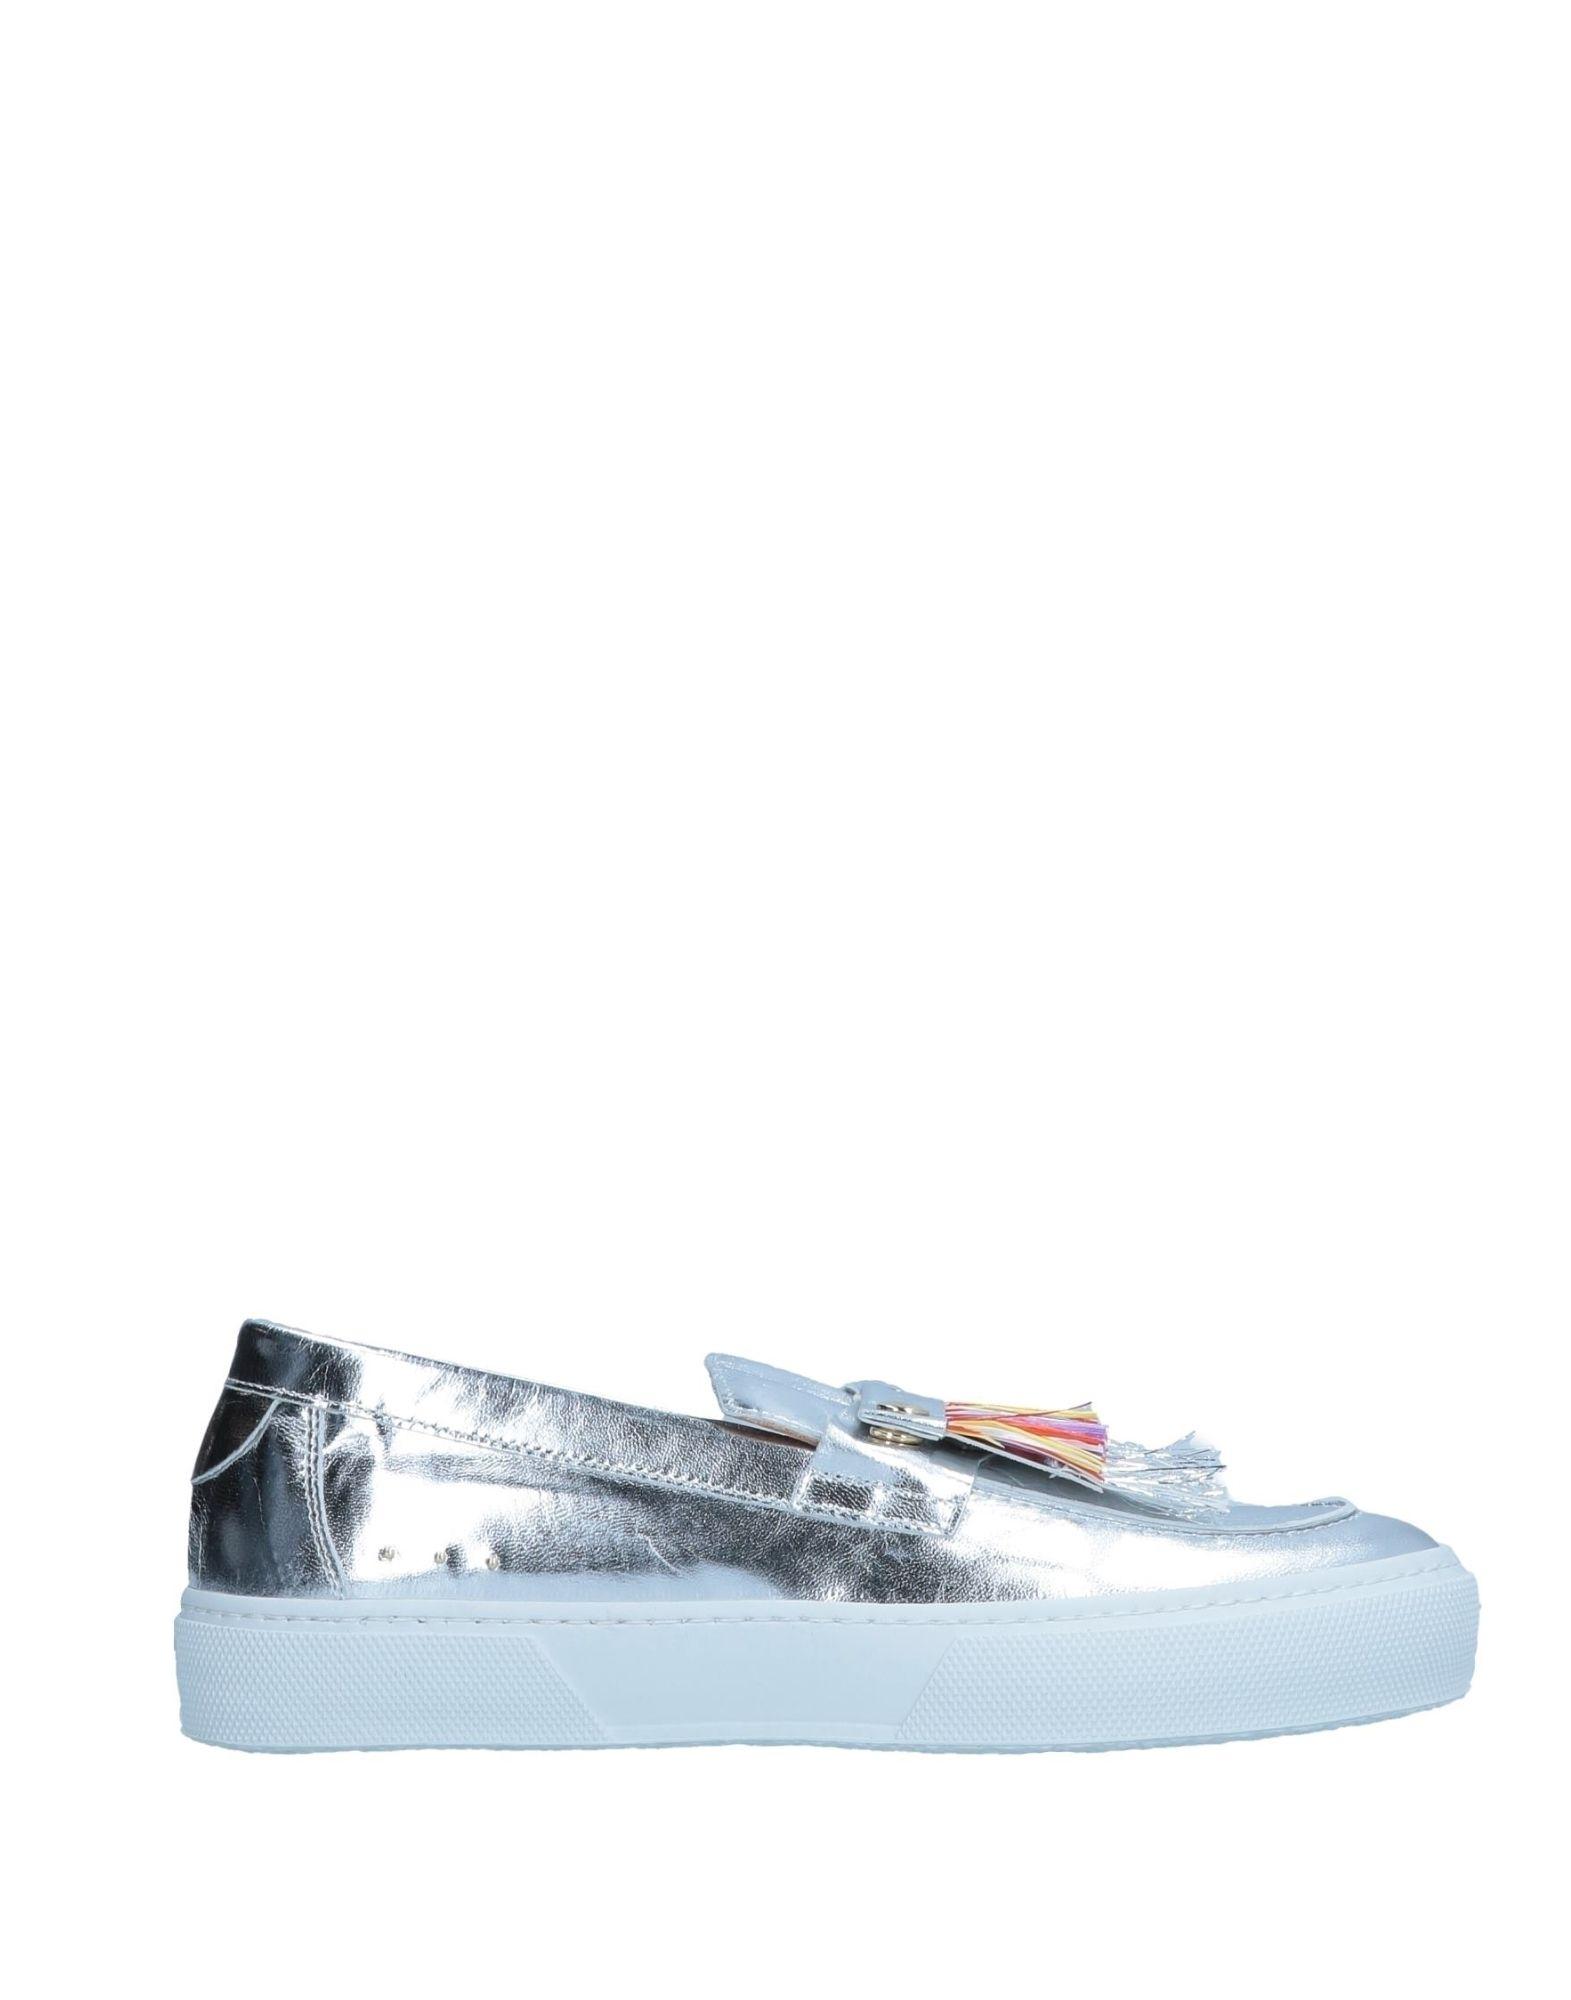 L'f Shoes Mokassins Damen  11545722CLGut aussehende strapazierfähige Schuhe